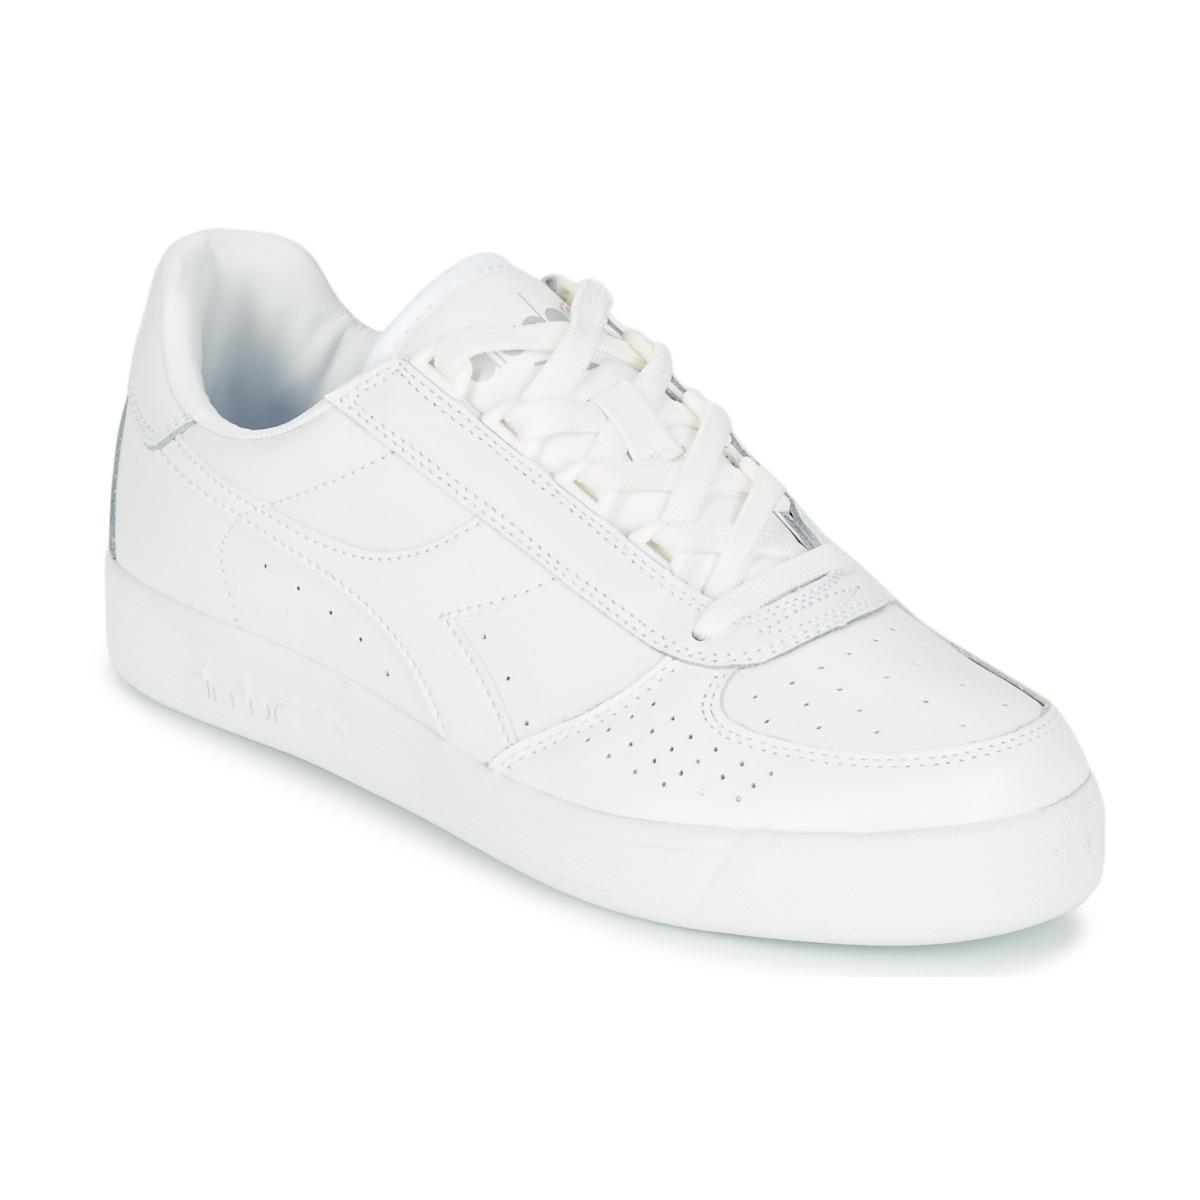 B ELITE SOCKS - CHAUSSURES - Sneakers & Tennis bassesDiadora zhUzt7oZkb